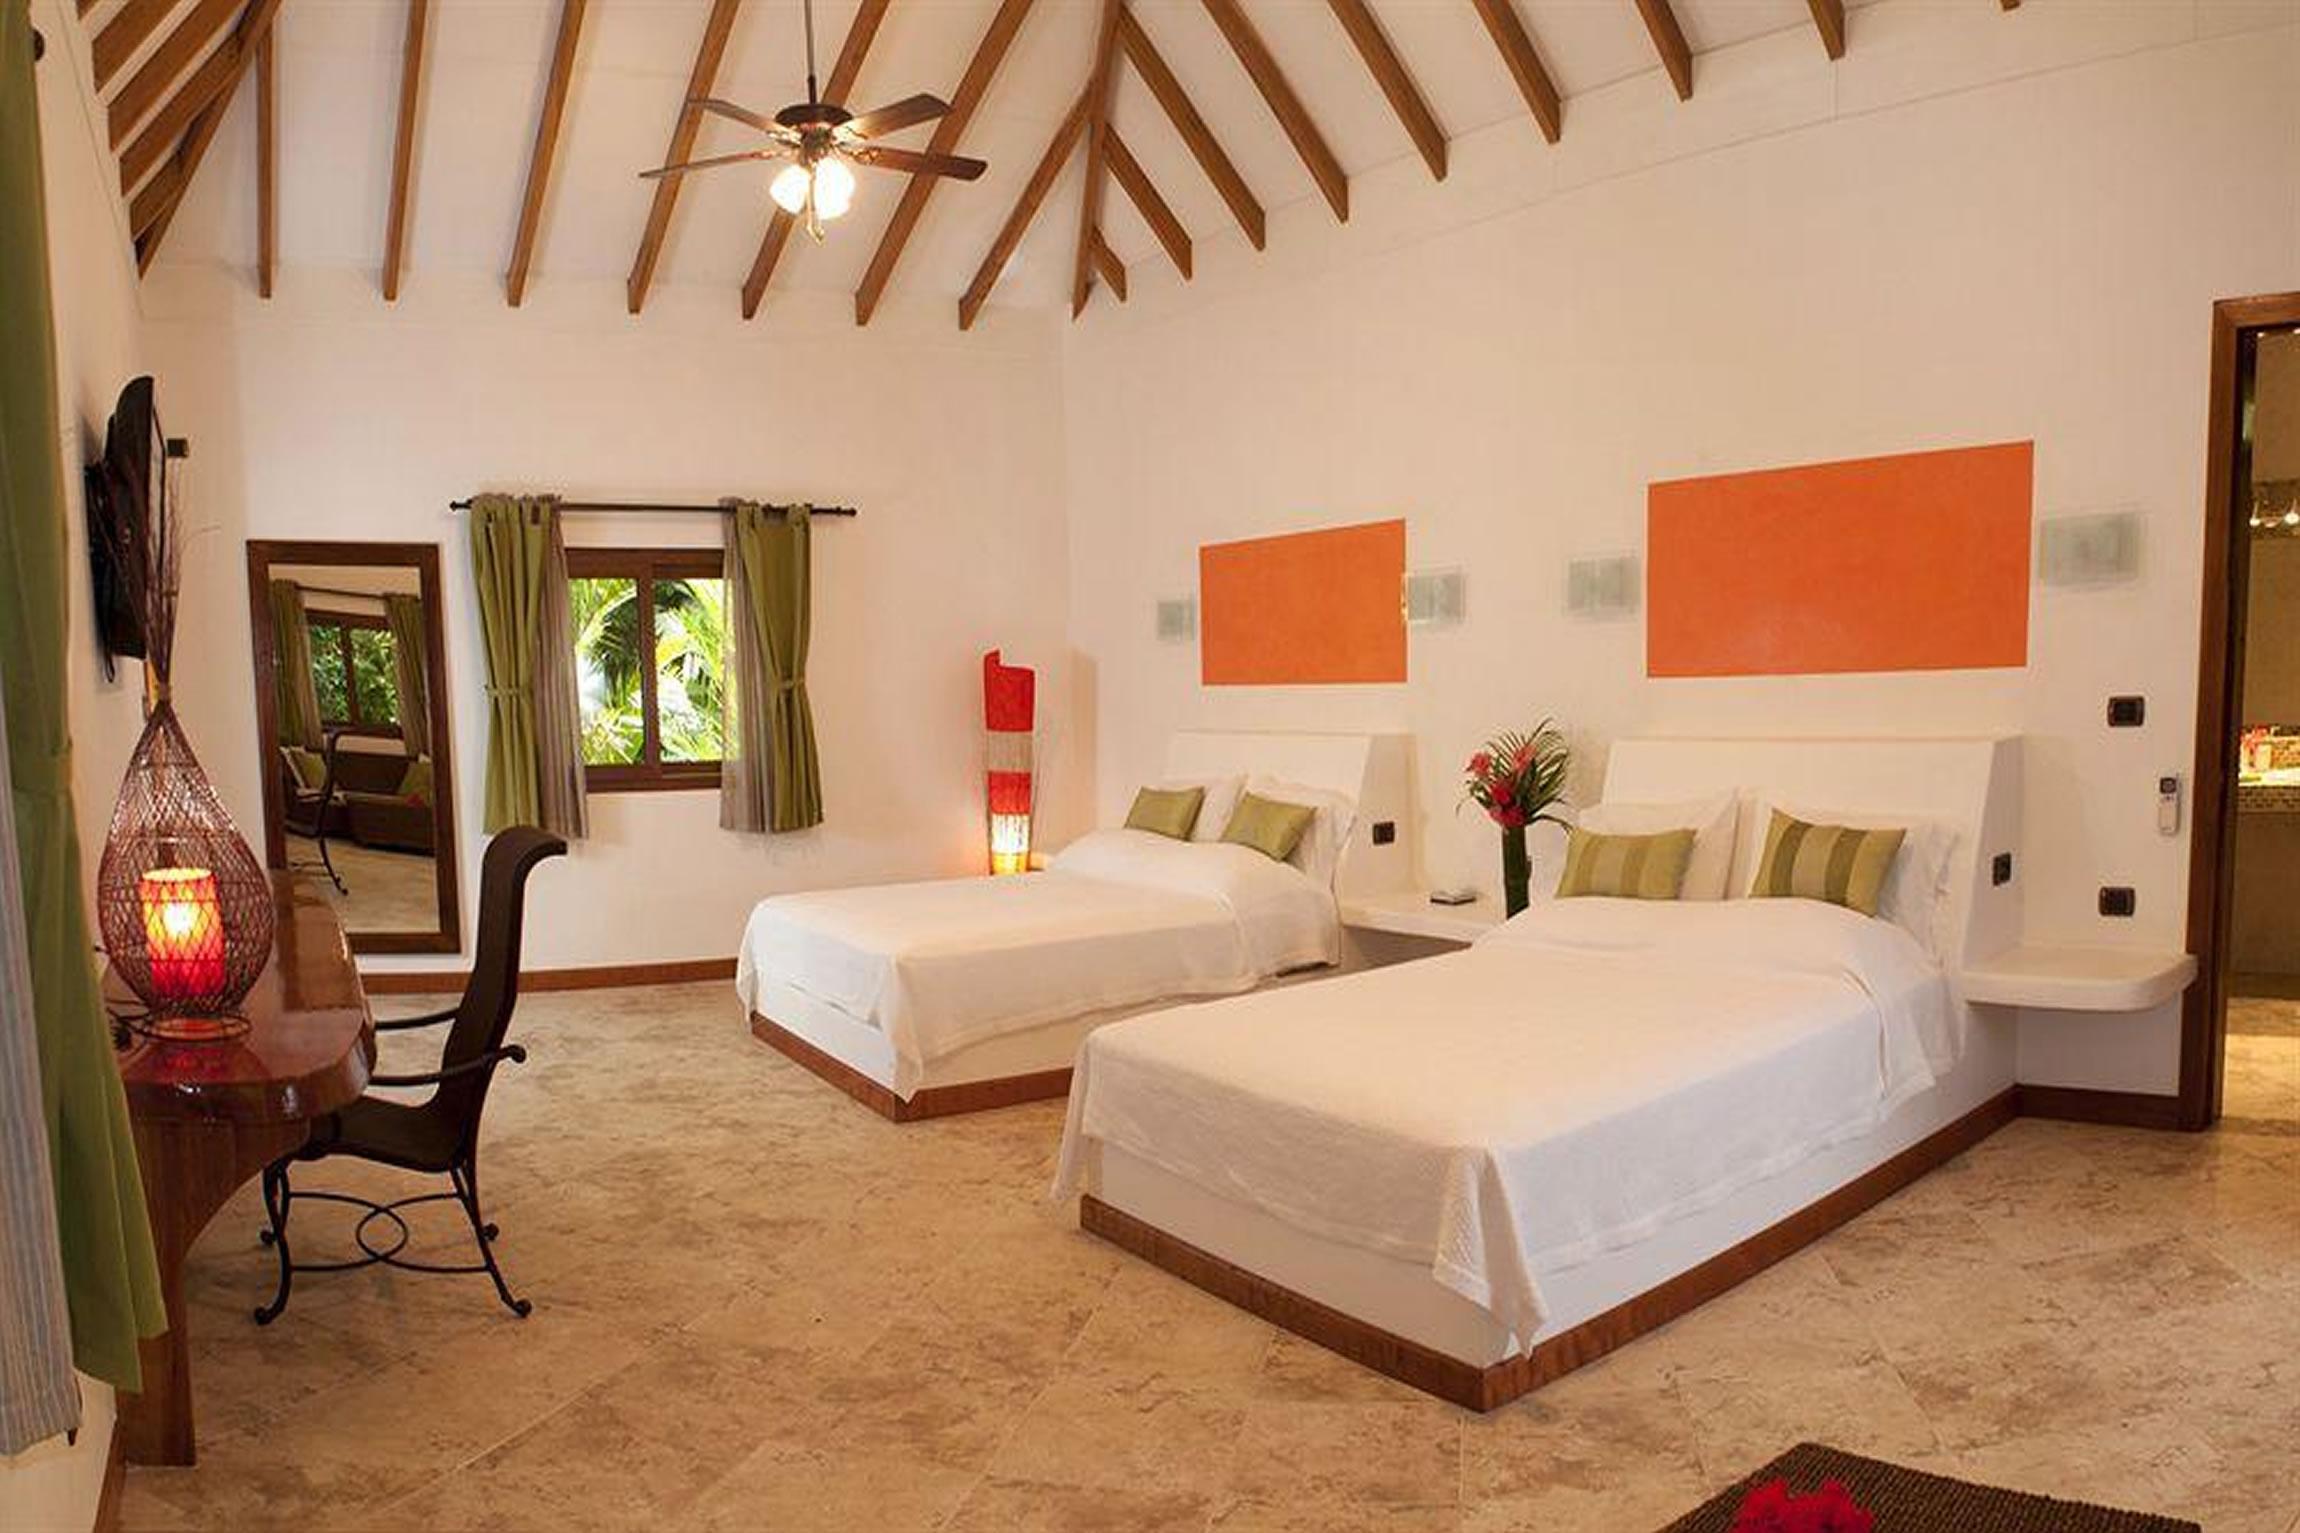 Costa-Rica-Holiday-Tours-Cariblue-Beach-Jungle-Resort-Interior-Room